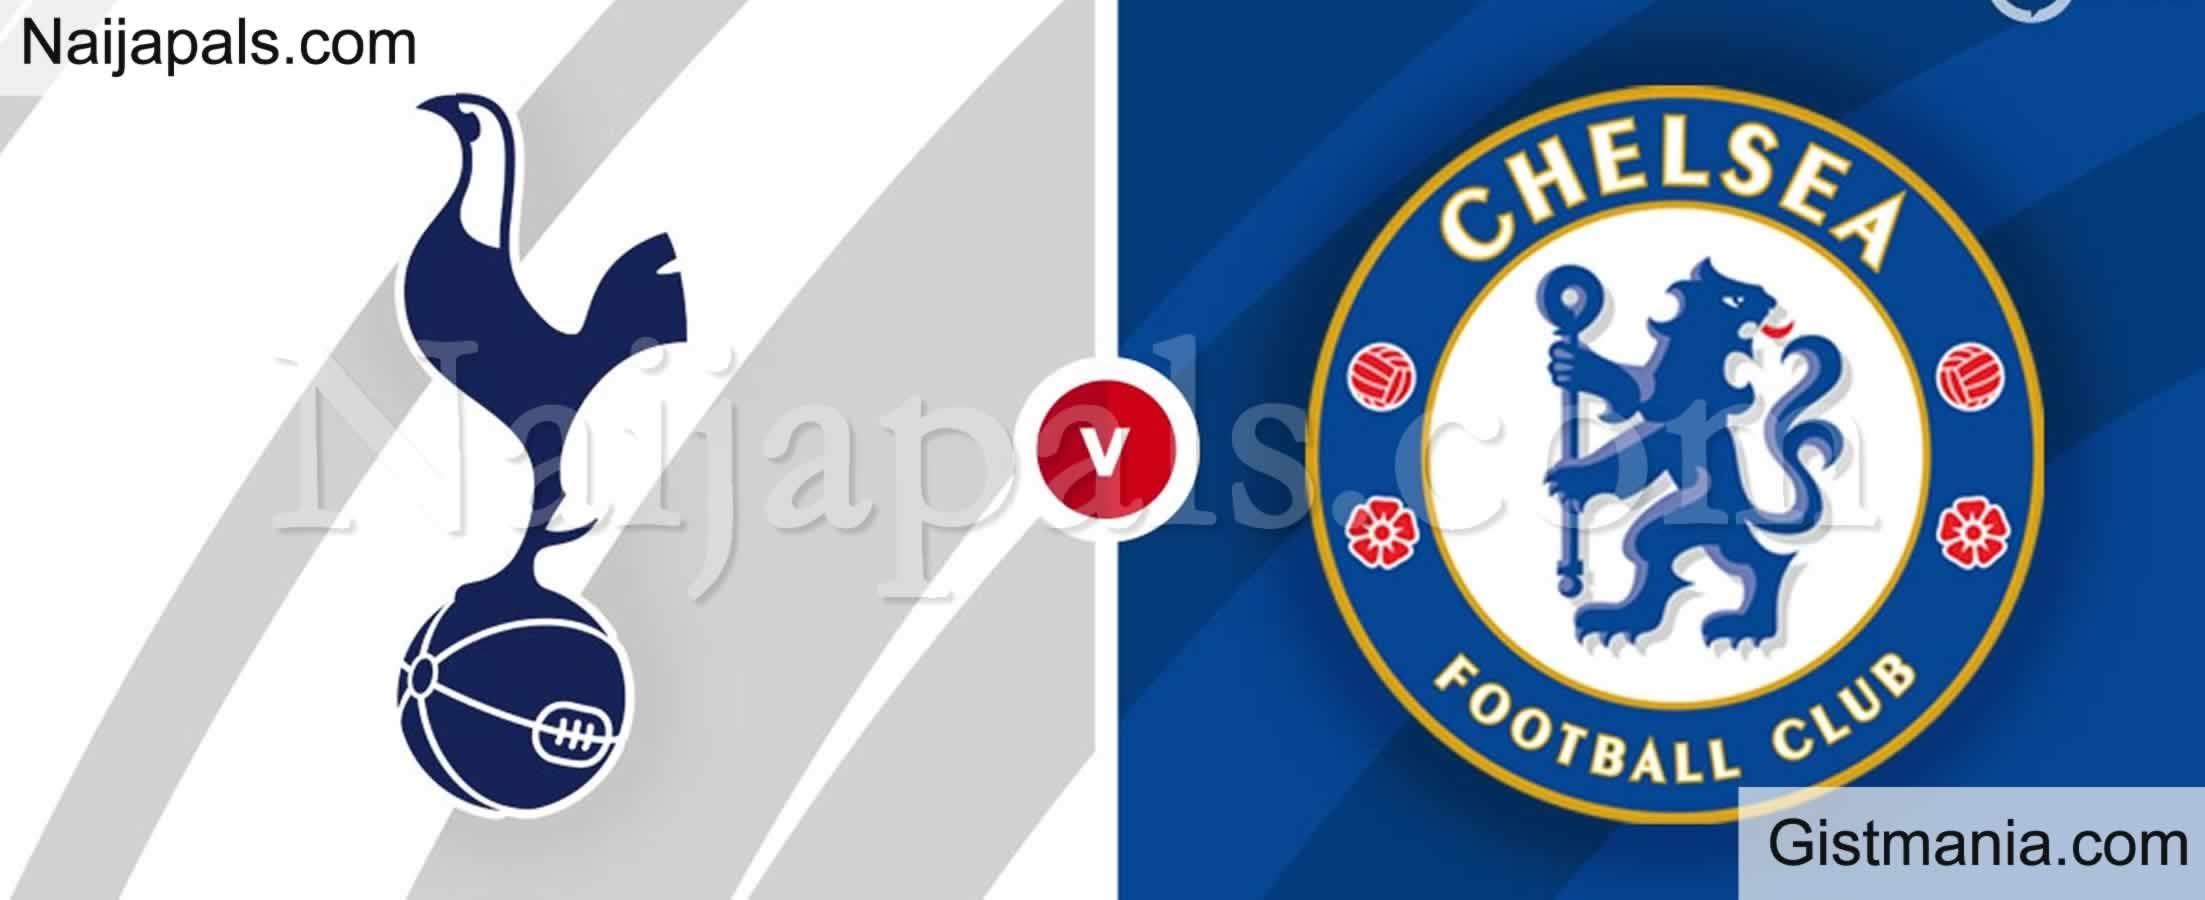 <img alt='.' class='lazyload' data-src='https://img.gistmania.com/emot/soccer.gif' /> <b>Tottenham Hotspur v Chelsea : English Premier League Match, Team News, Goal Scorers and Stats</b>